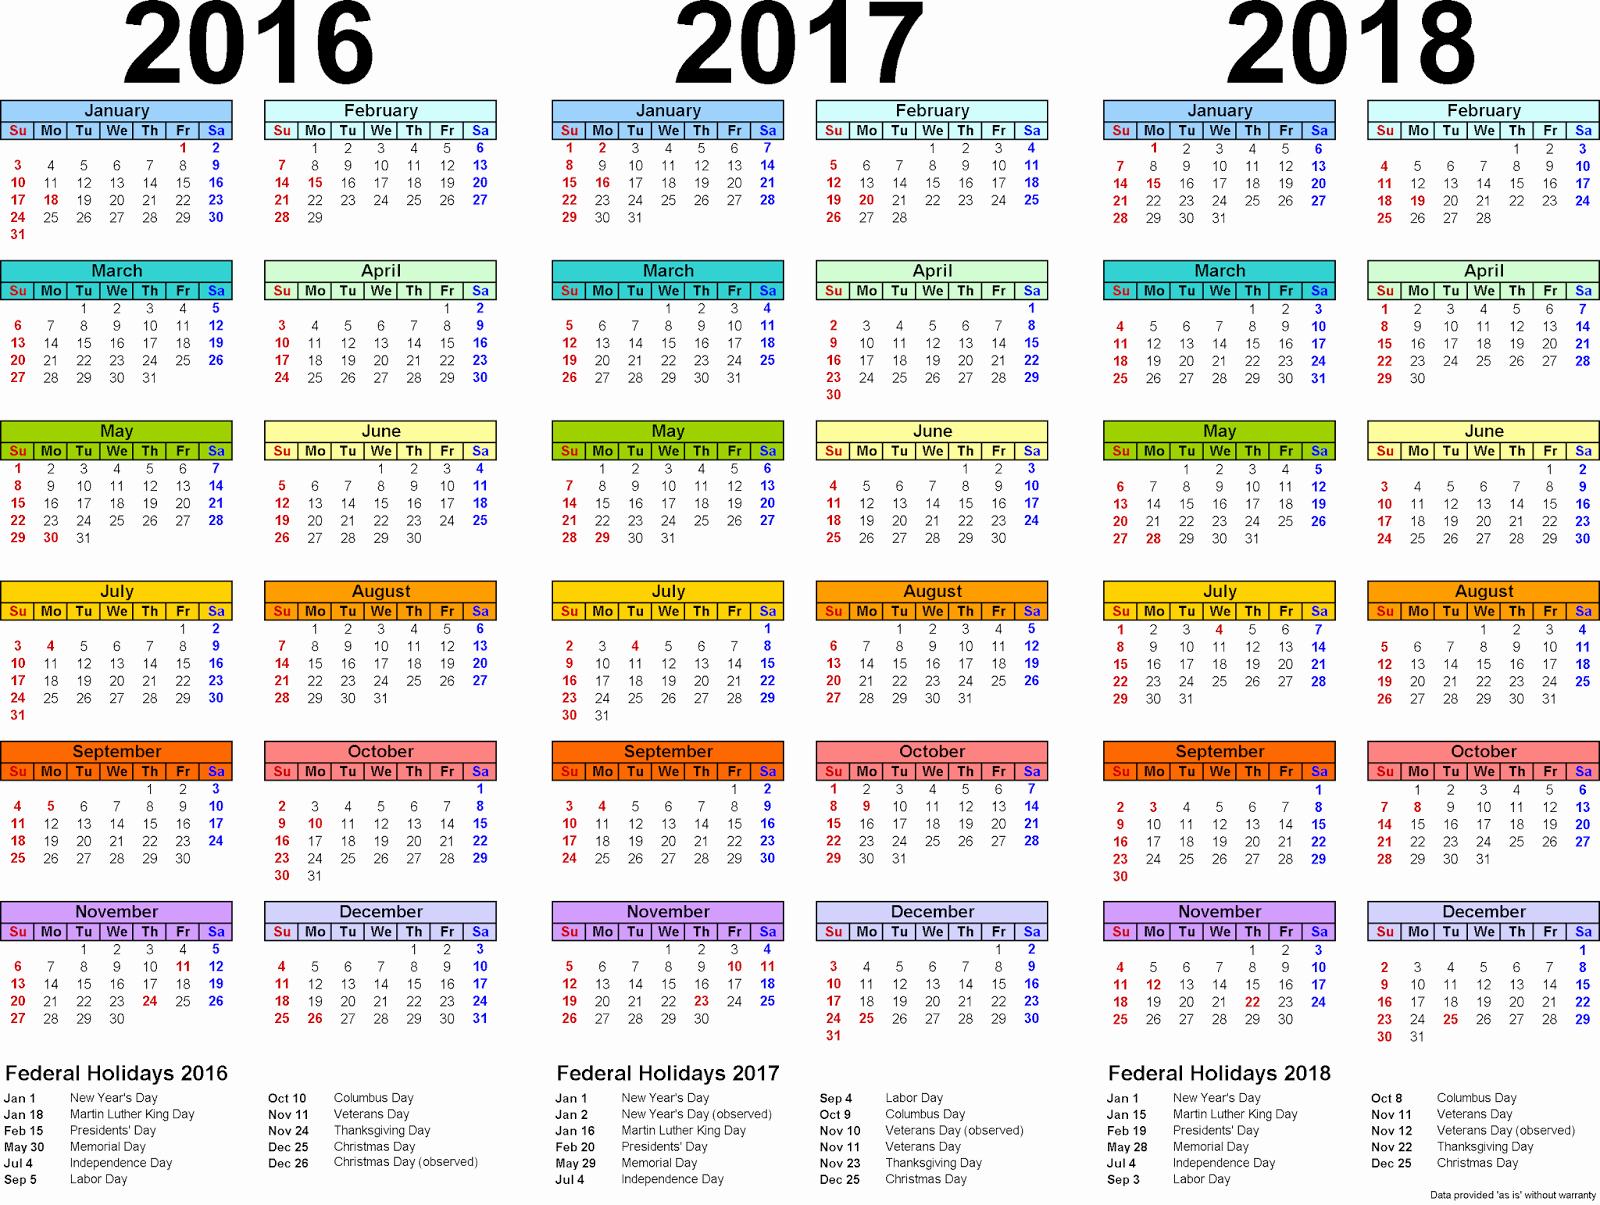 2017-2018 Blank Calendar Awesome 2016 2017 2018 Calendar 3 Year Printable